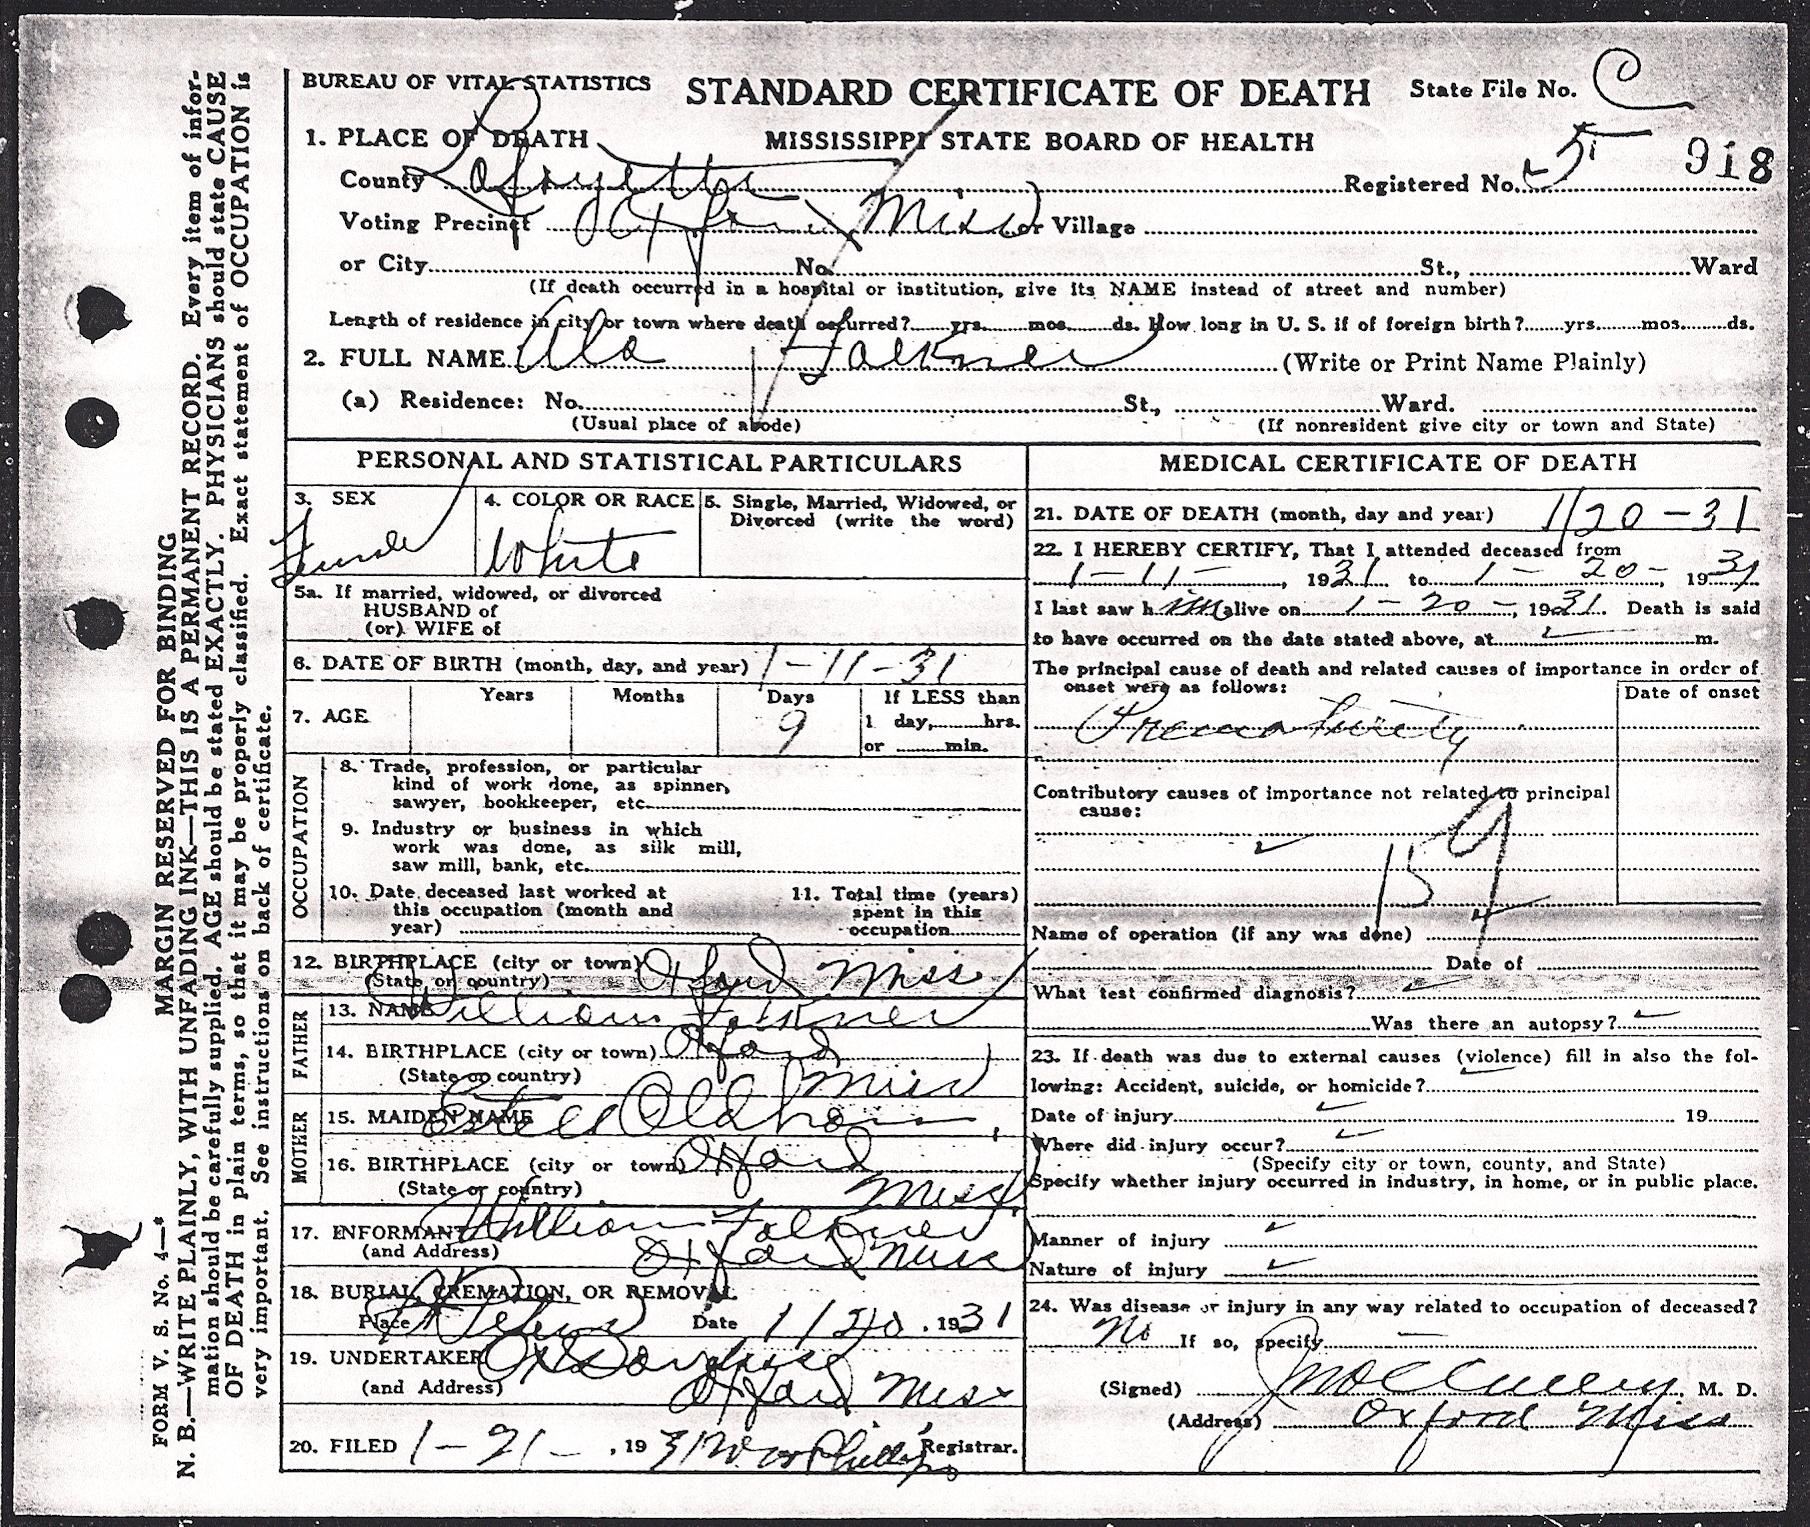 Alabama faulkner 1931 1931 find a grave memorial 1931 01 20 alabama faulkner death certificate positive microfilm image xflitez Choice Image